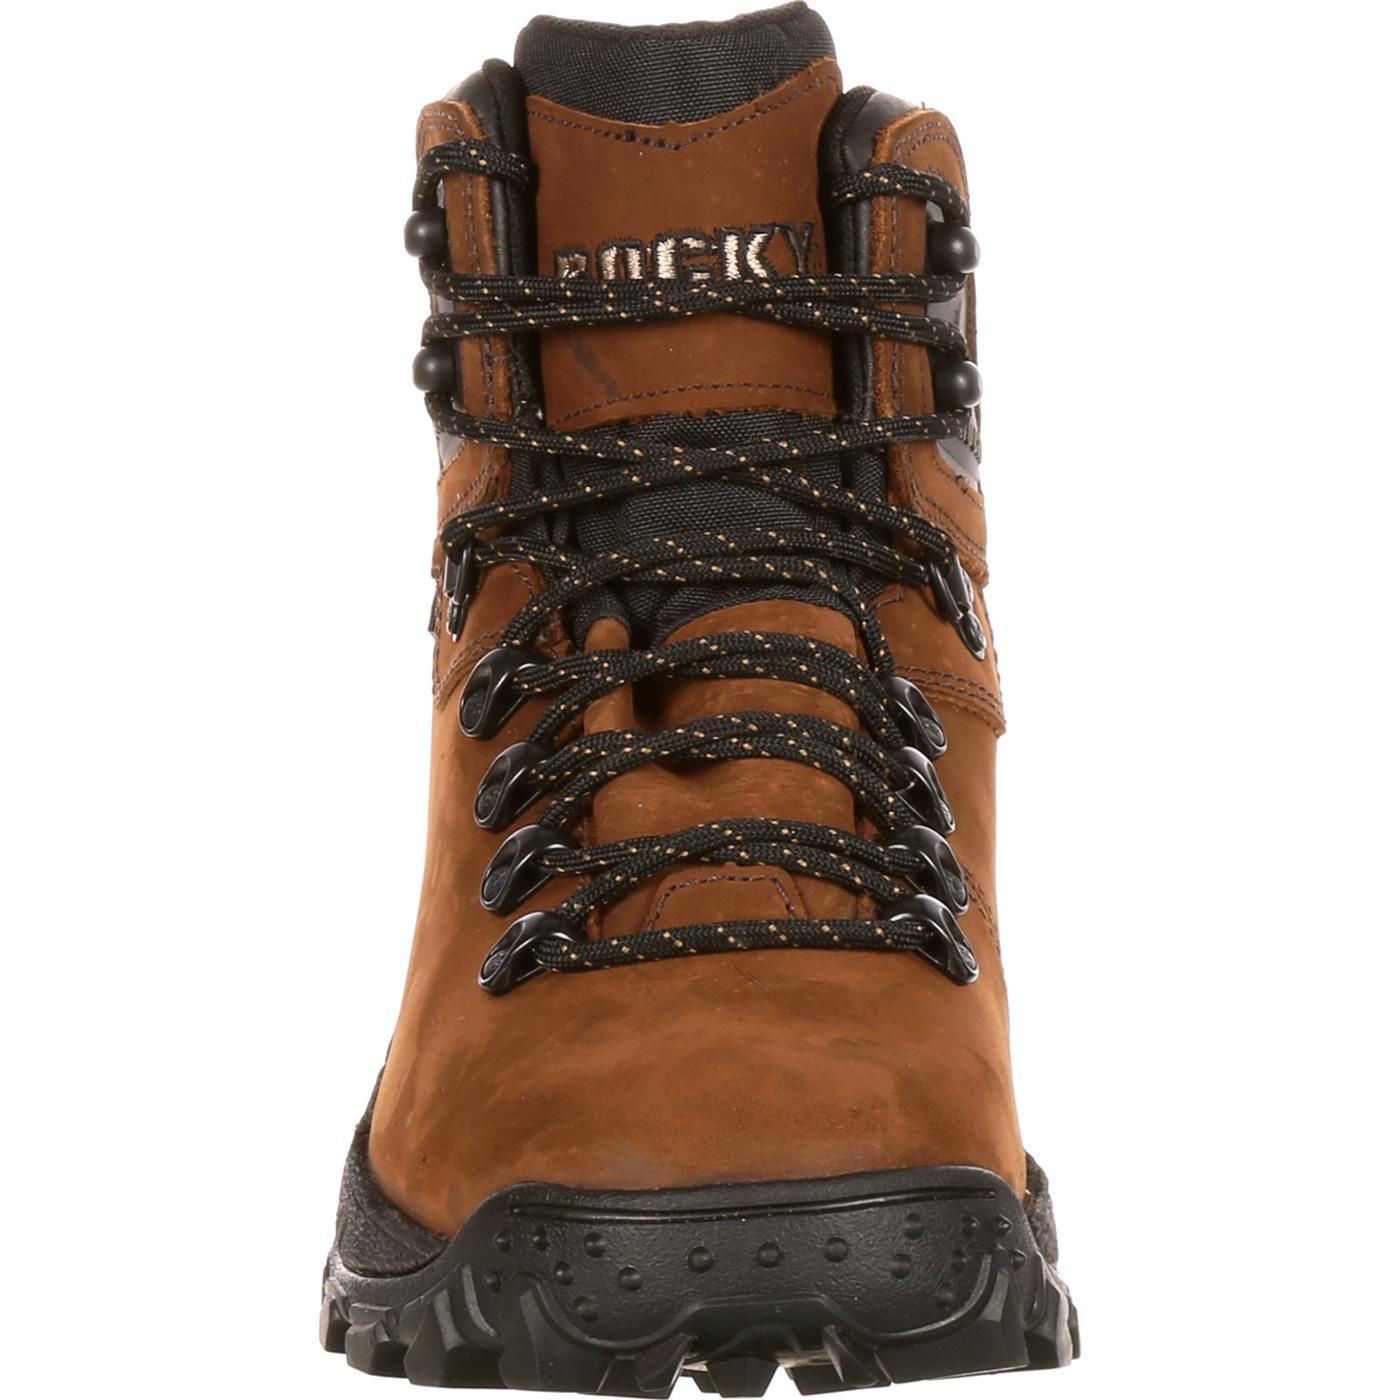 410af8761bf Rocky Ridgetop GORE-TEX® Waterproof Hiker Boot